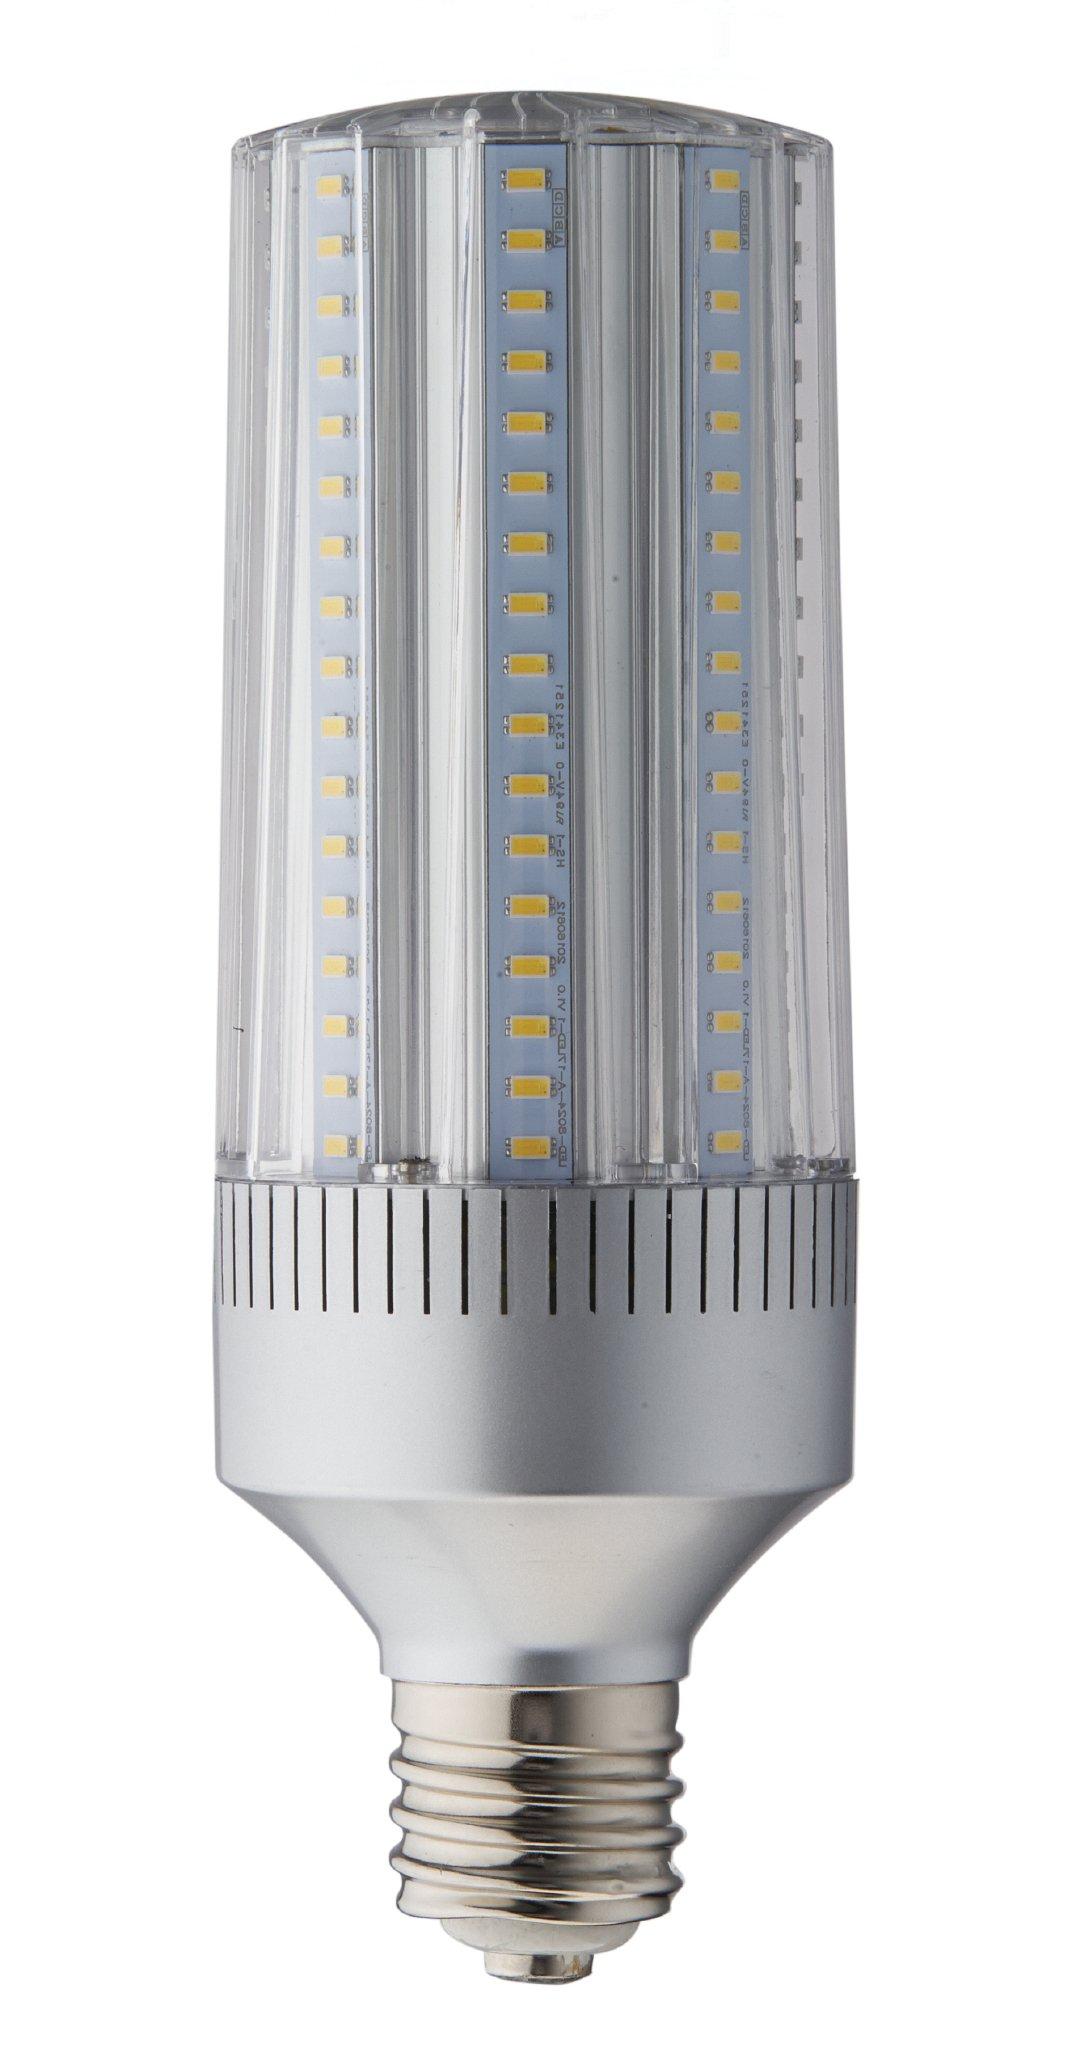 Light Efficient Design LED-8024M42K HID LED Retrofit Lighting 45-watt UL Rated Light Bulb